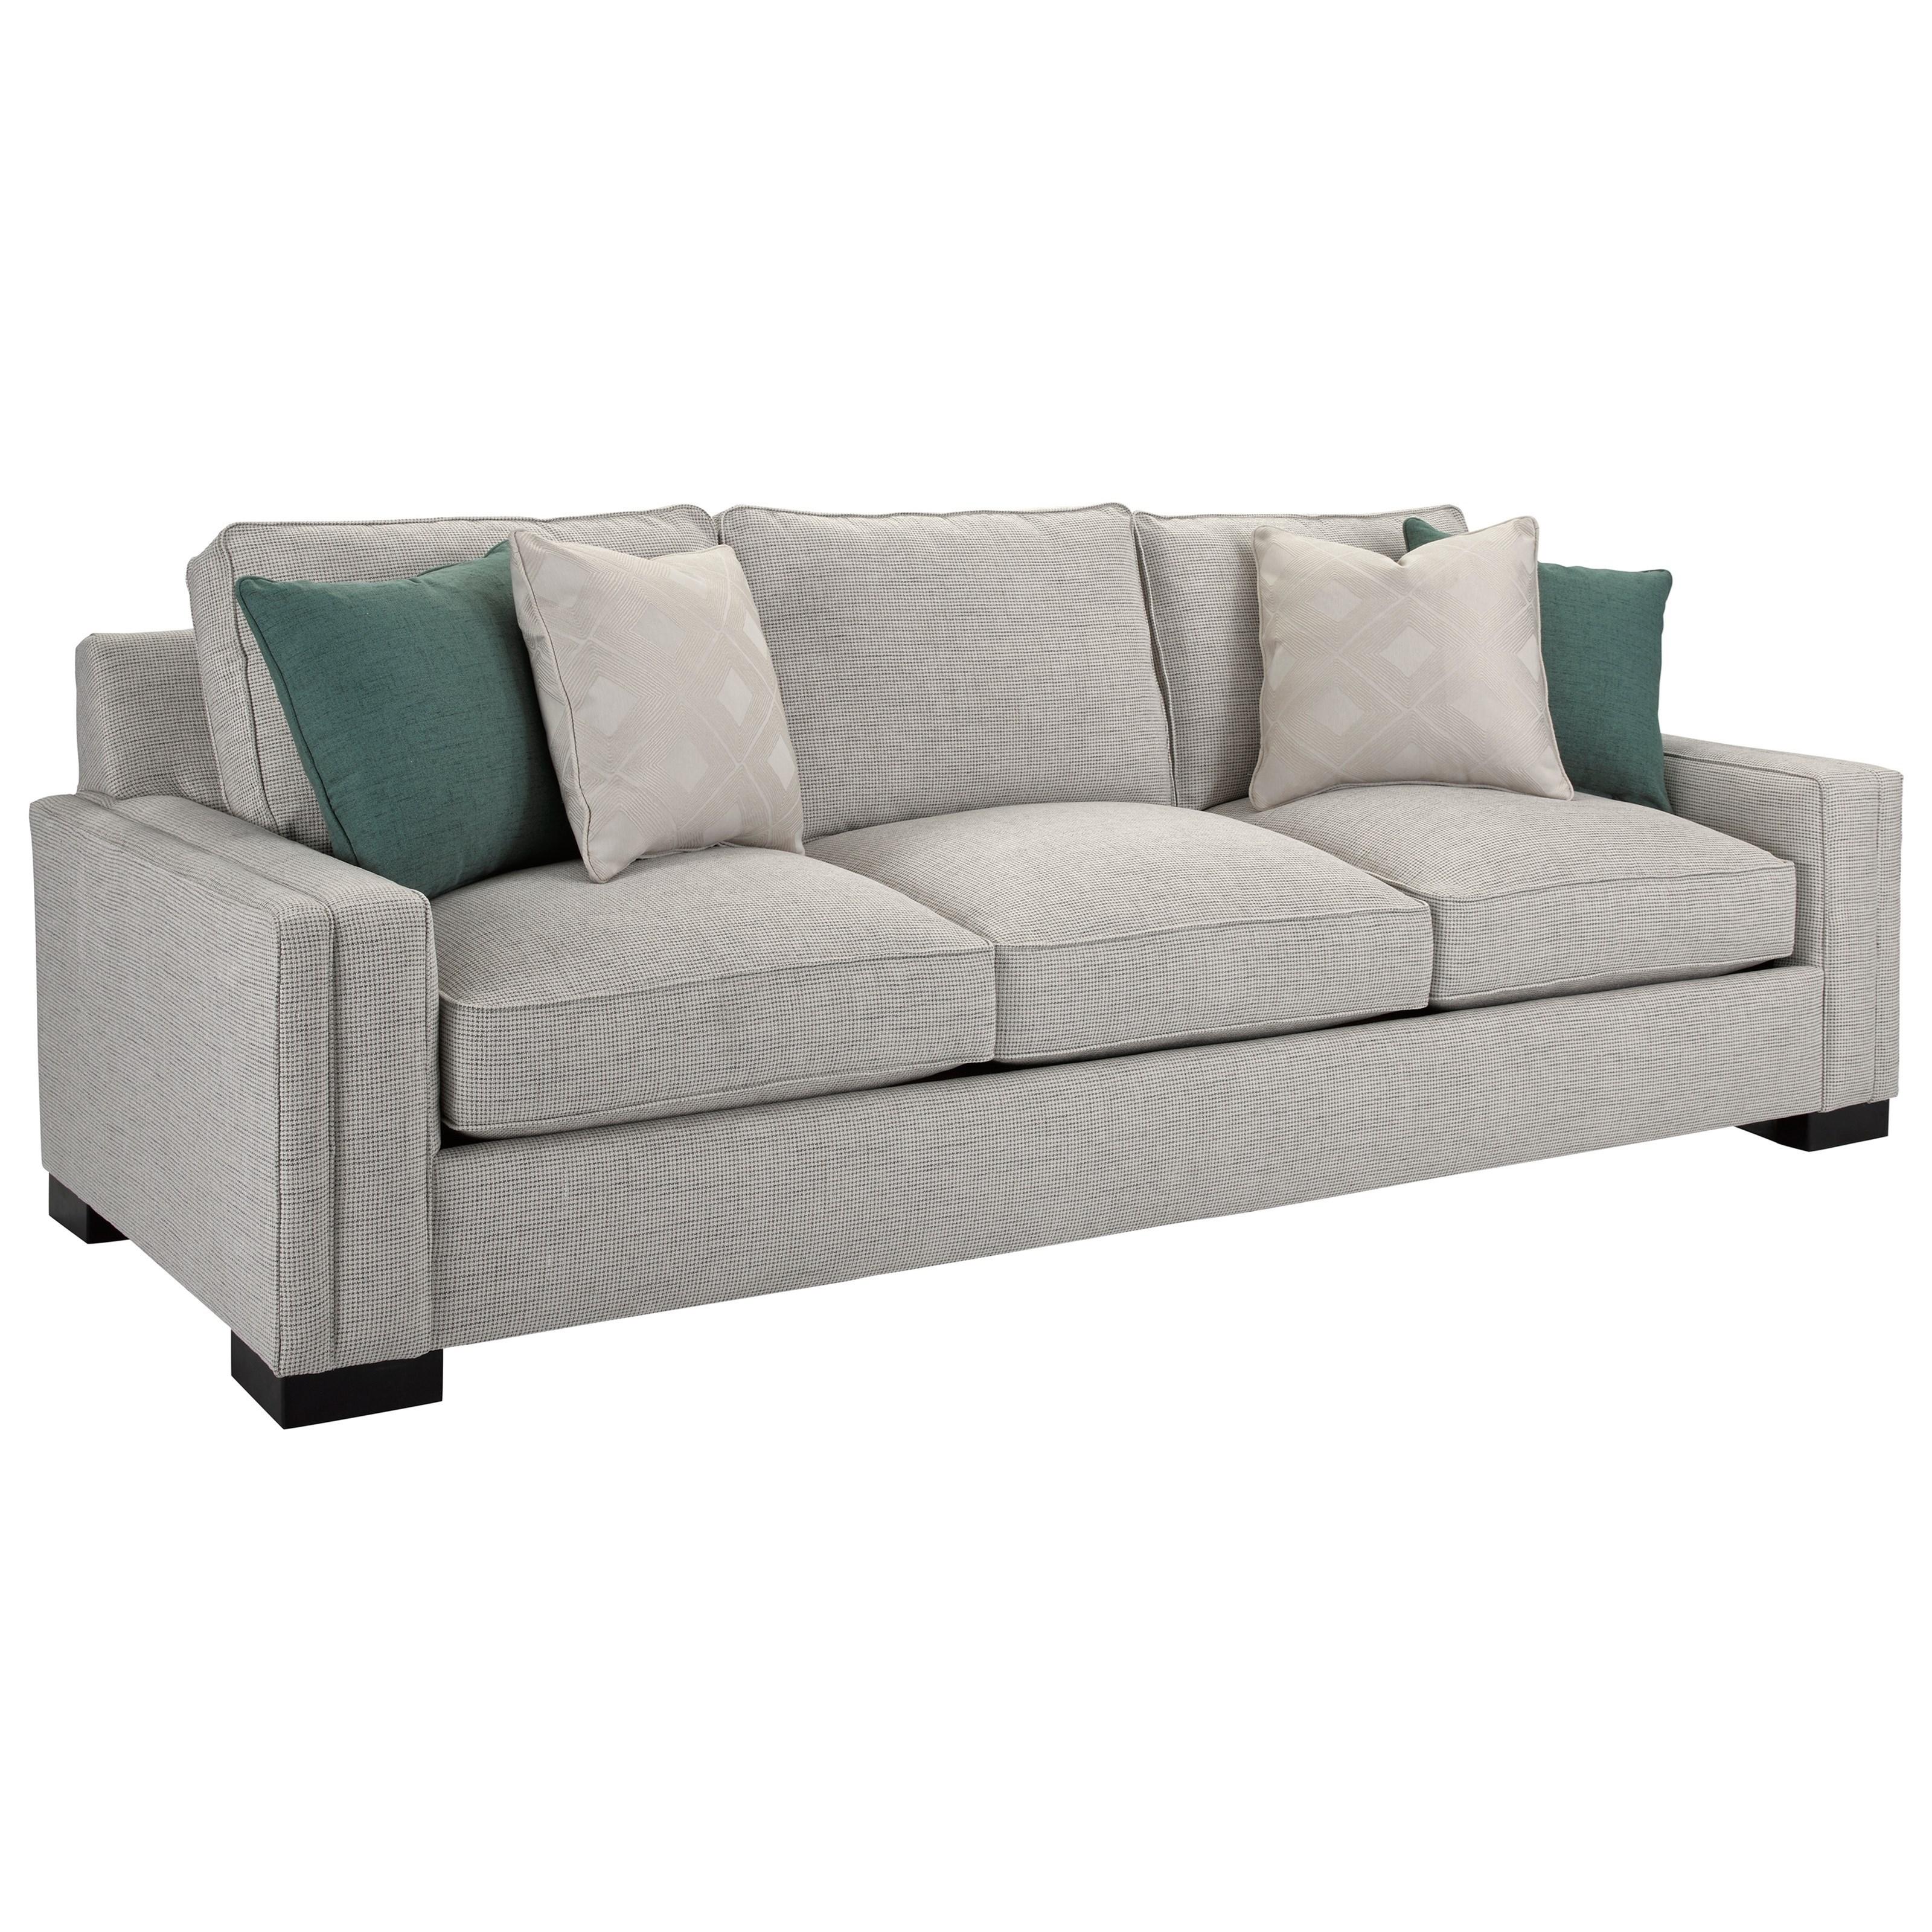 Broyhill Furniture RoccoSofa